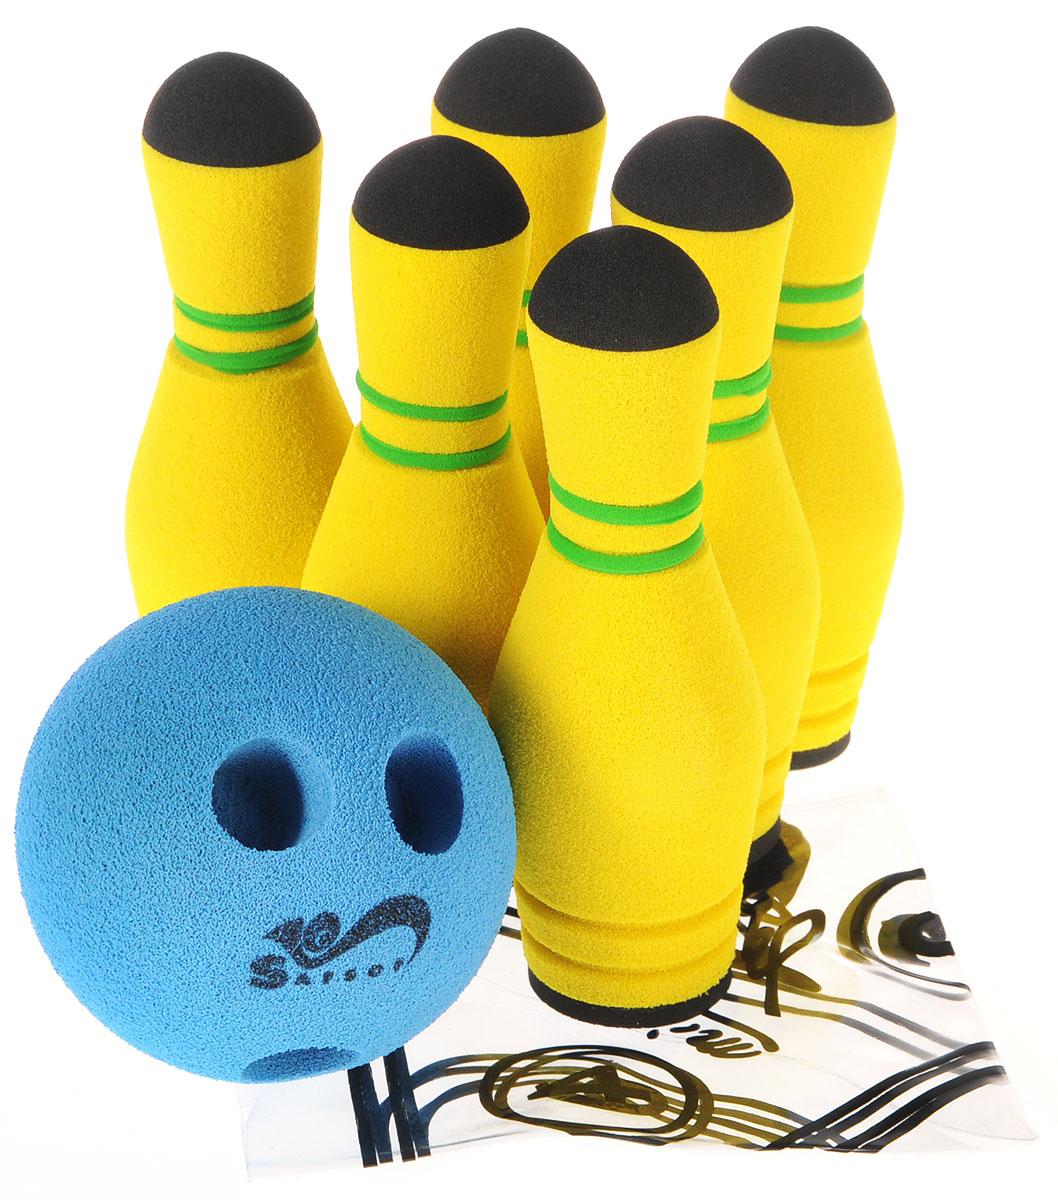 Safsof Игровой набор Мини-боулинг цвет желтый синий